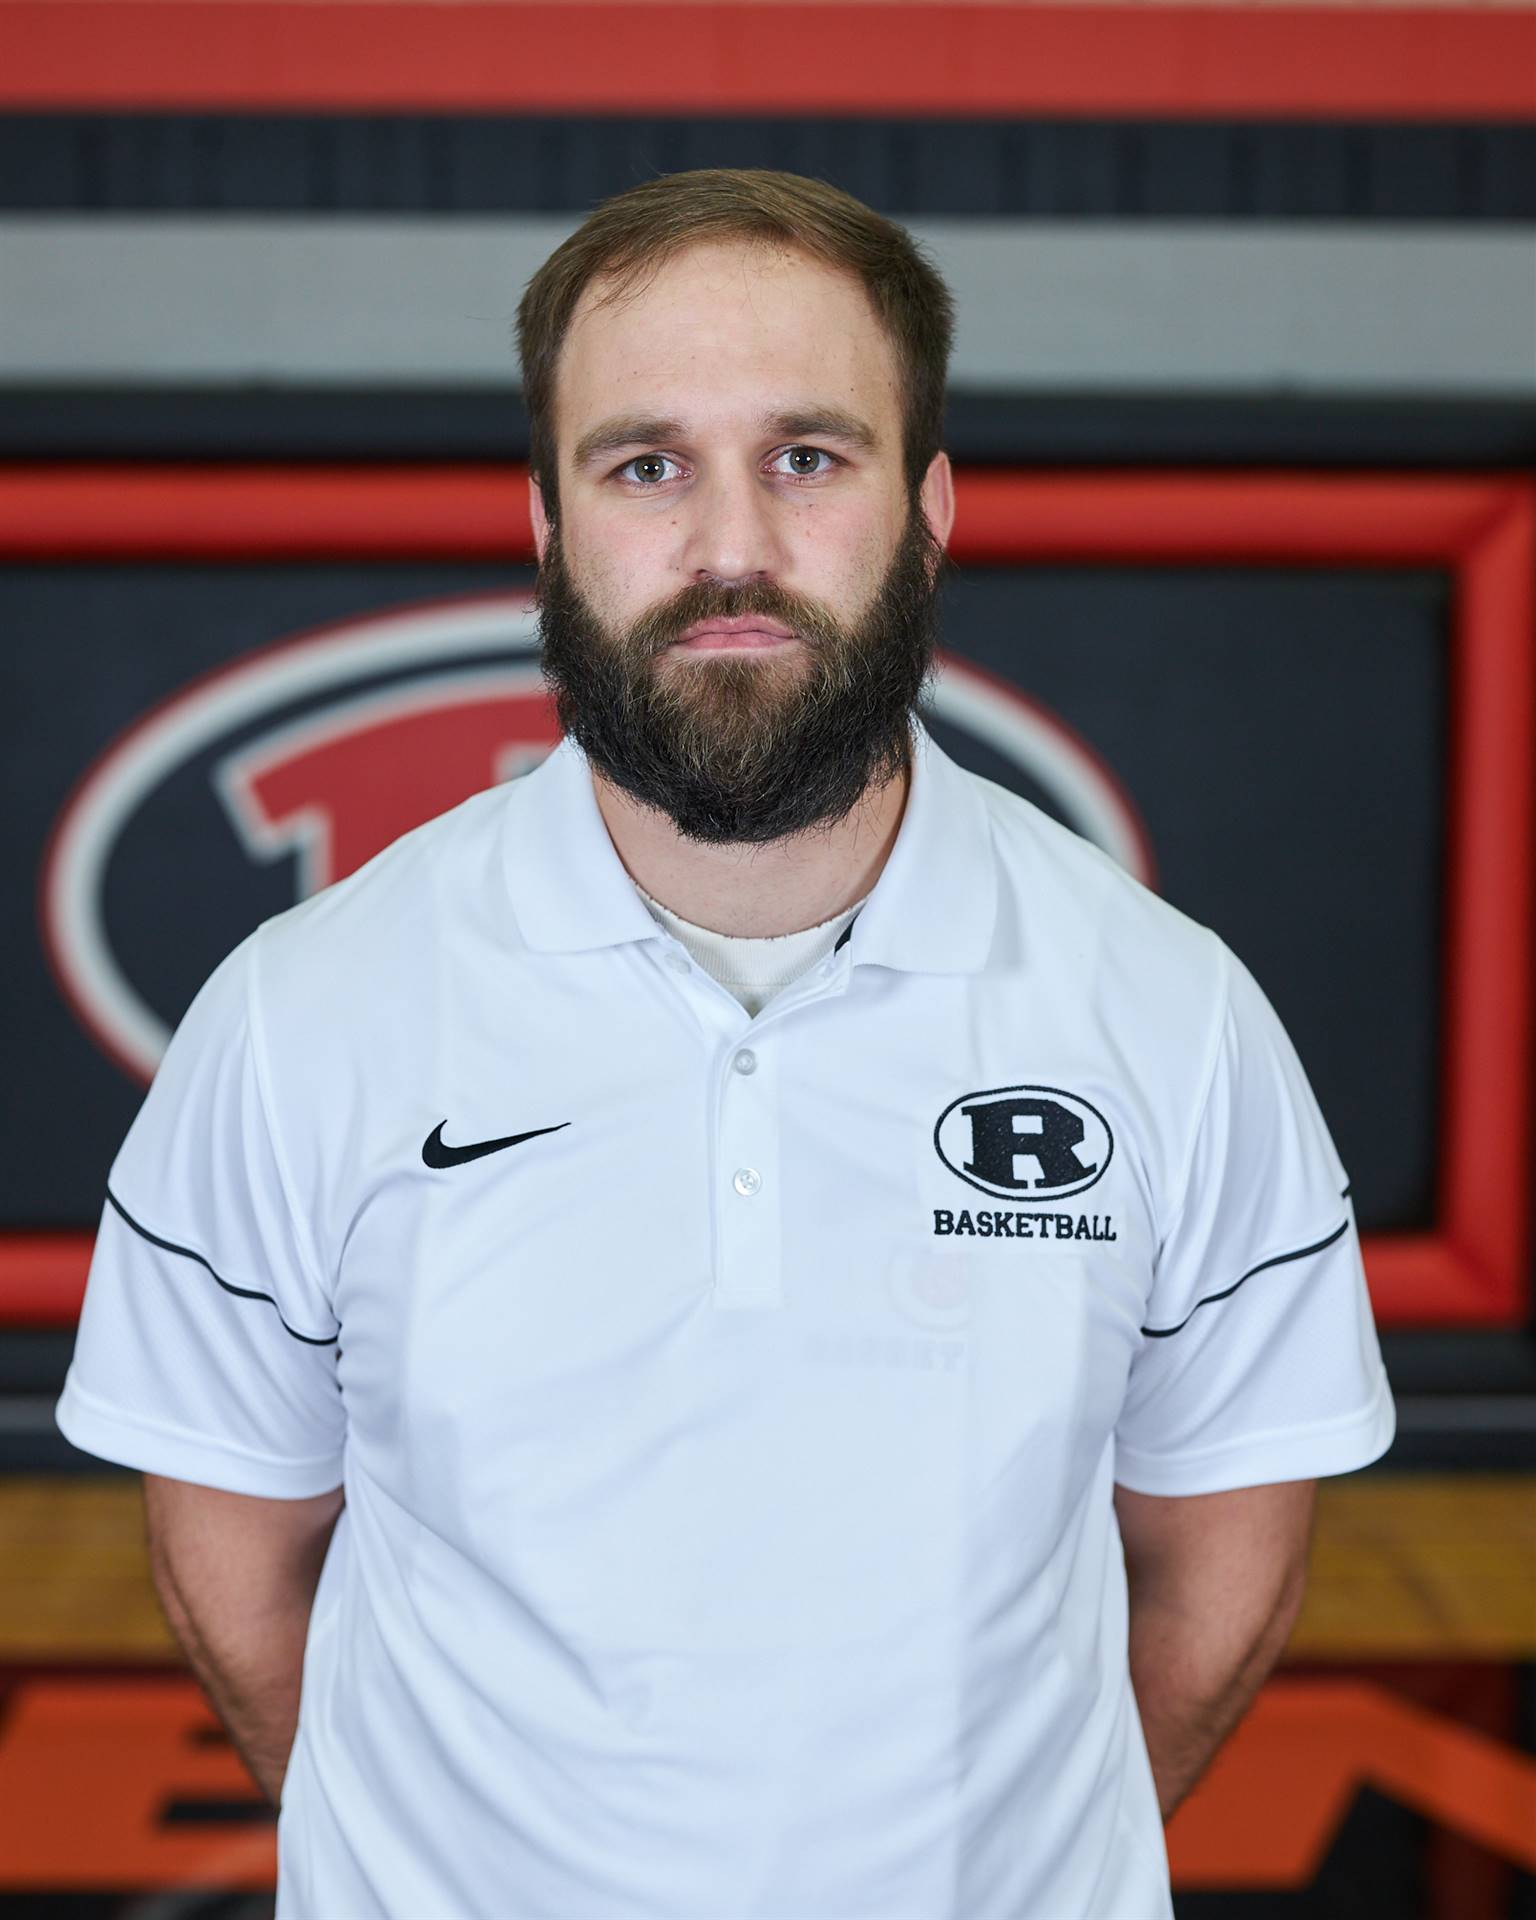 2019-20 boys coach 3